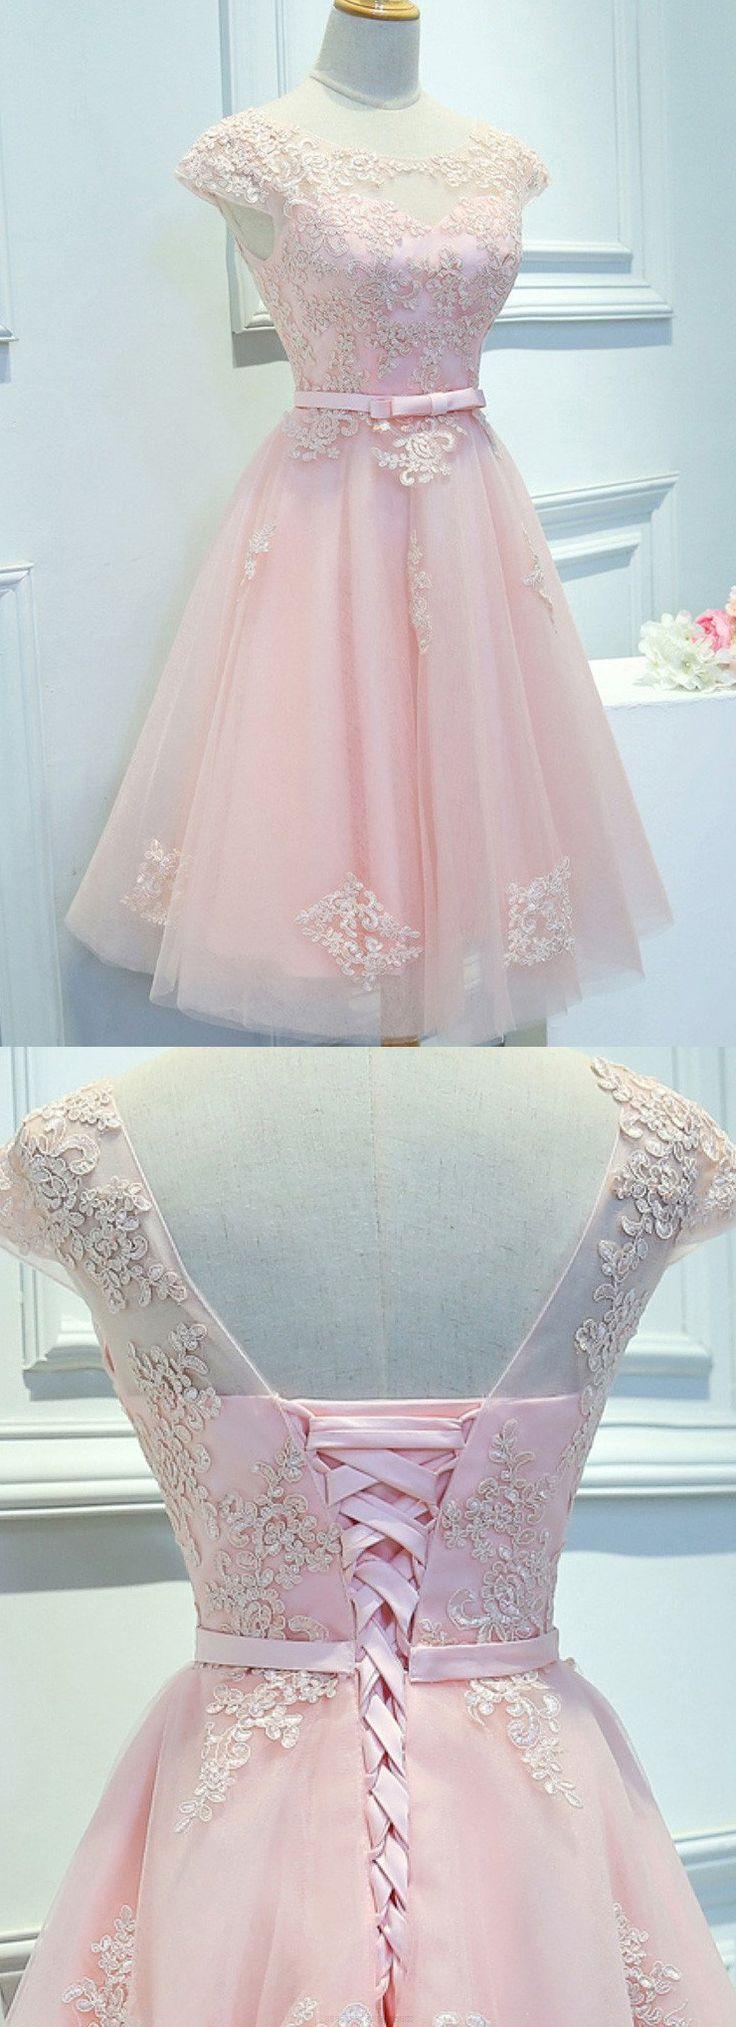 Pink Loveliness